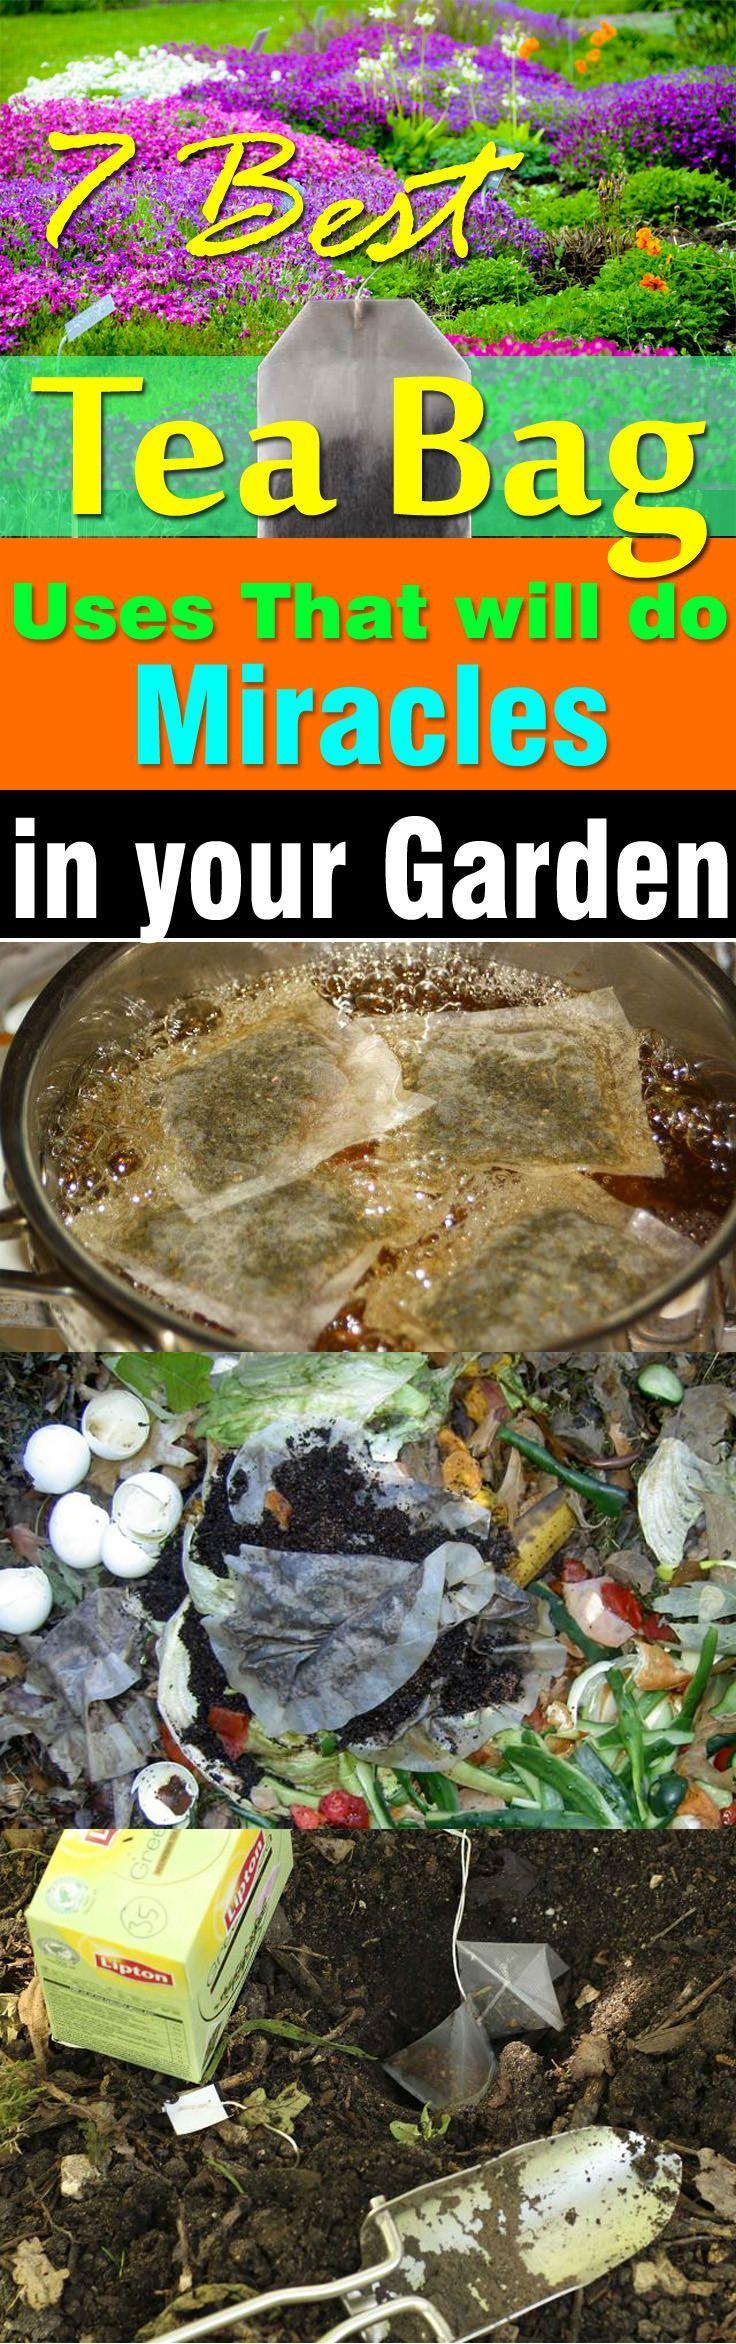 Garden adventures white turmeric curcuma zedoaria - 7 Best Tea Bag Uses That Will Do Miracles In Your Garden